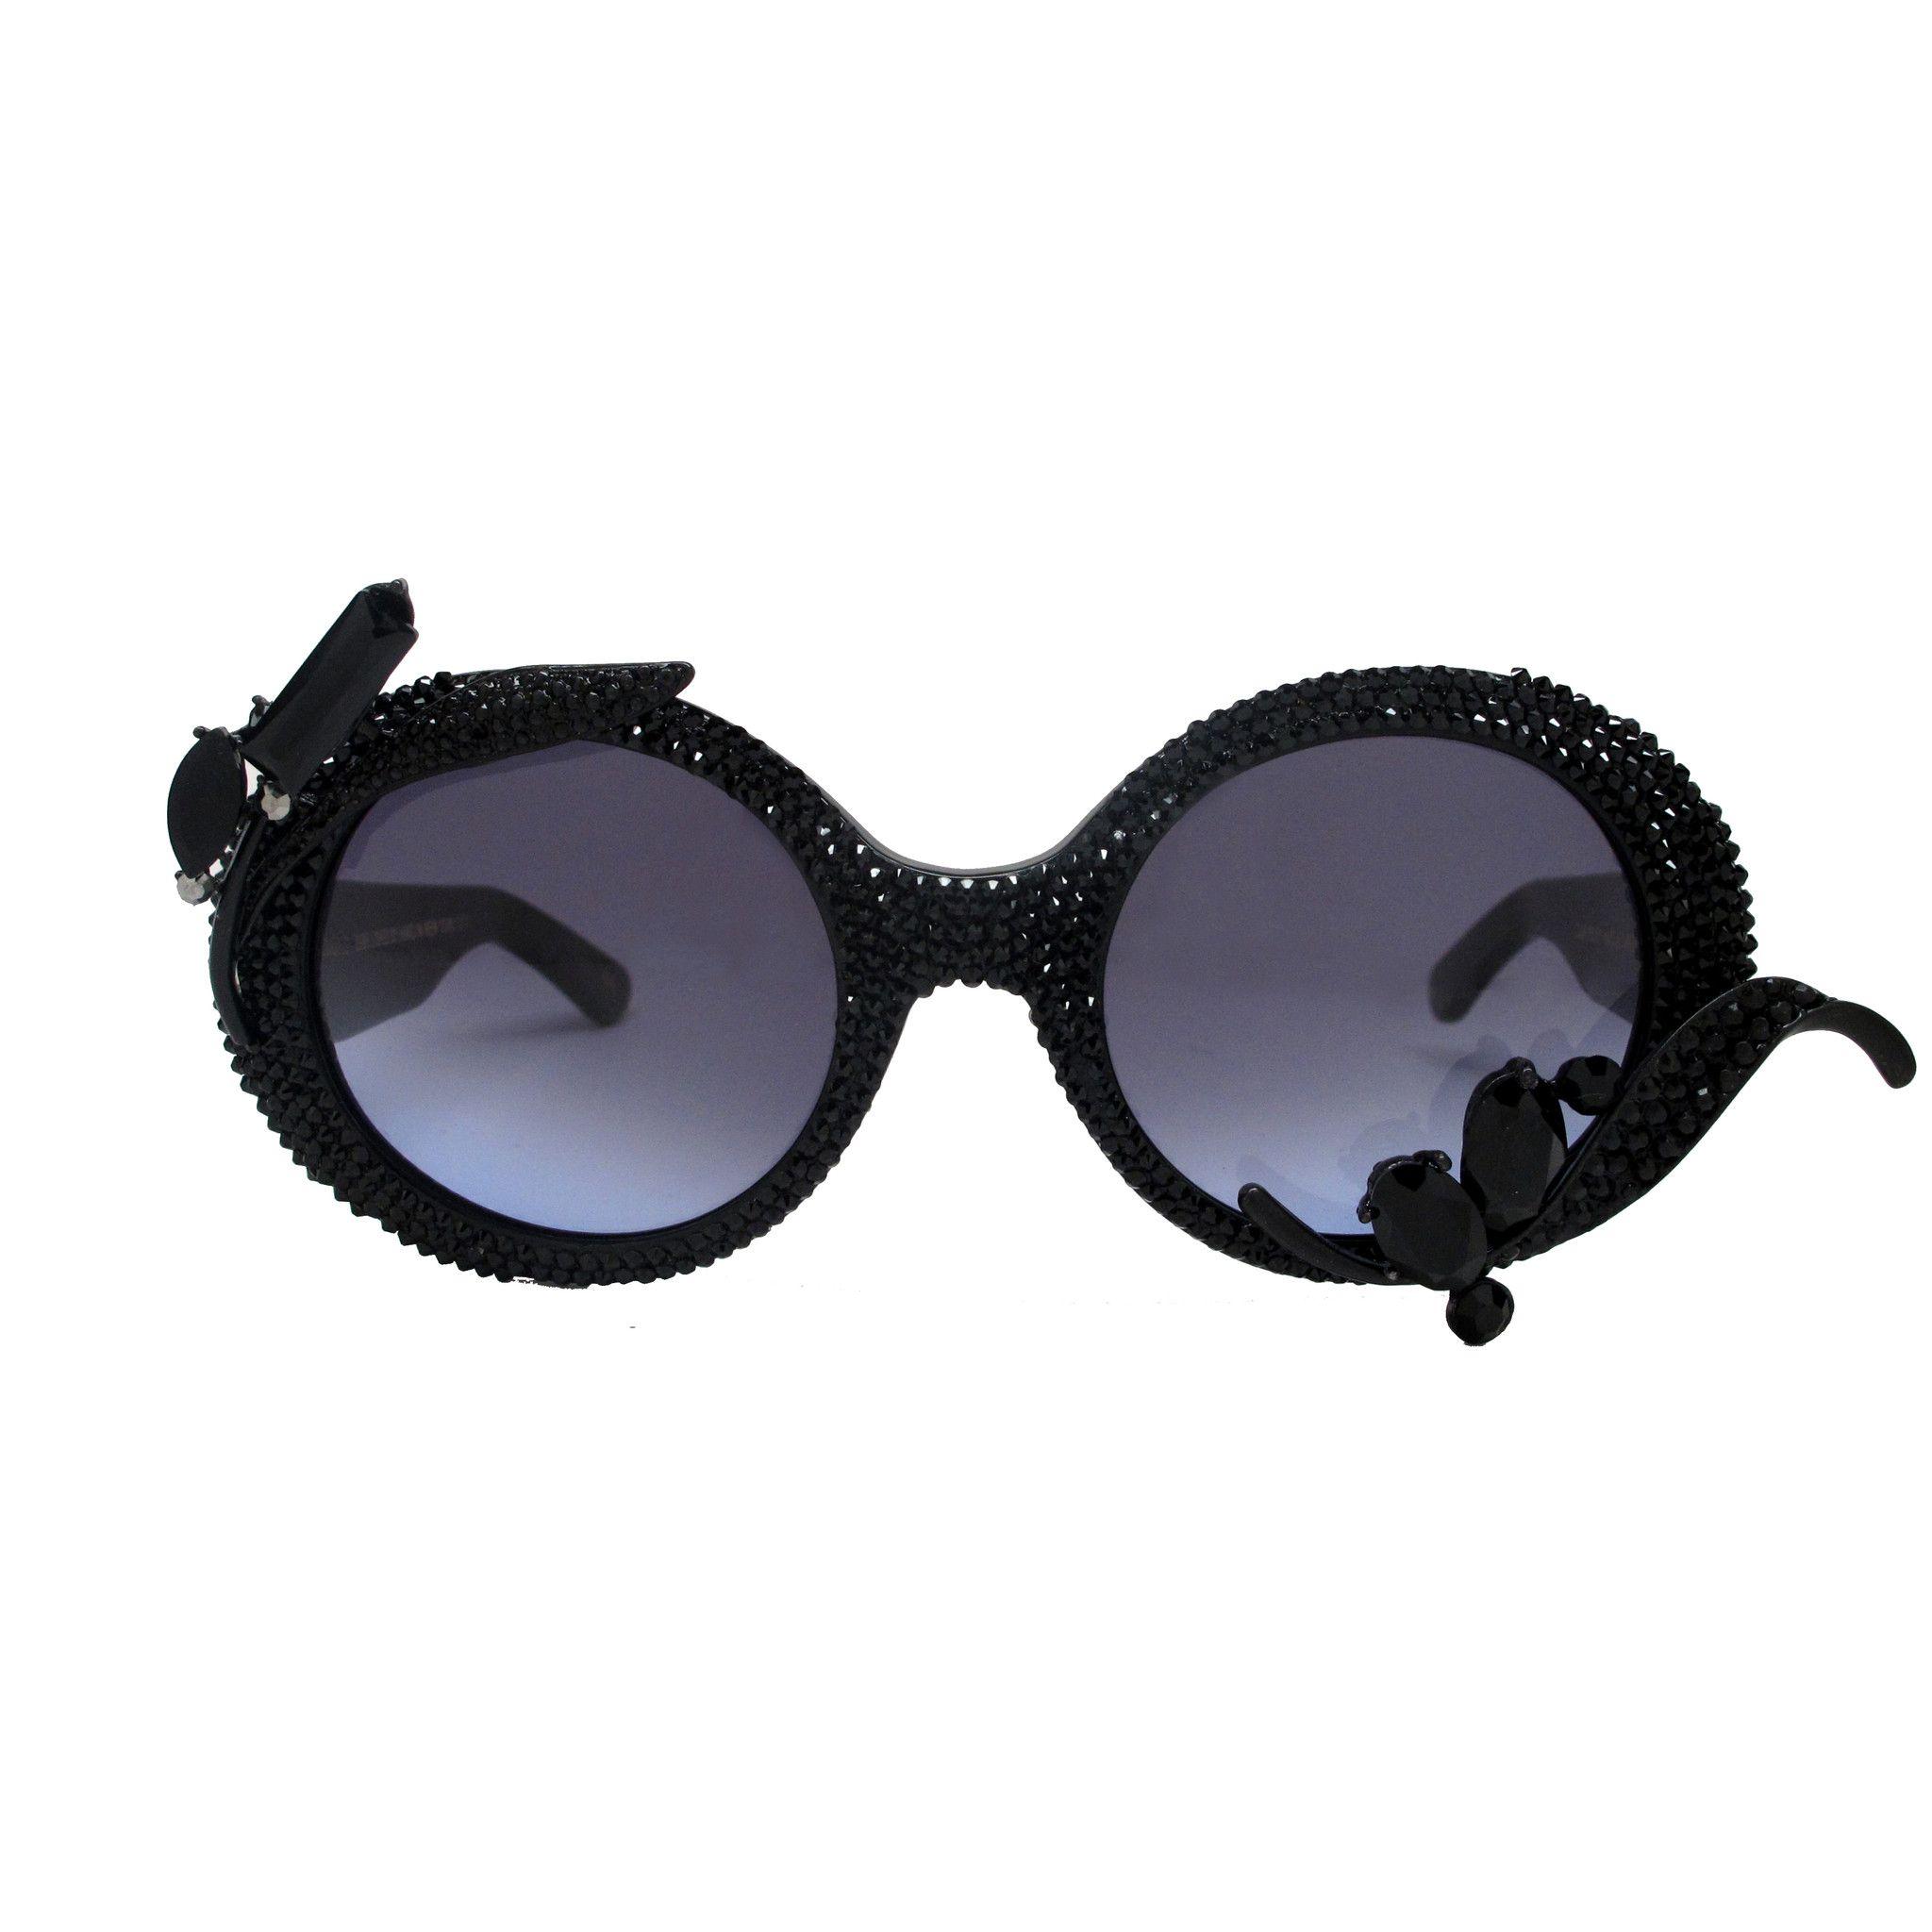 12278ede20 A-Morir Eyewear has been pioneering the embellished eyewear trend since  Rocked by Rihanna